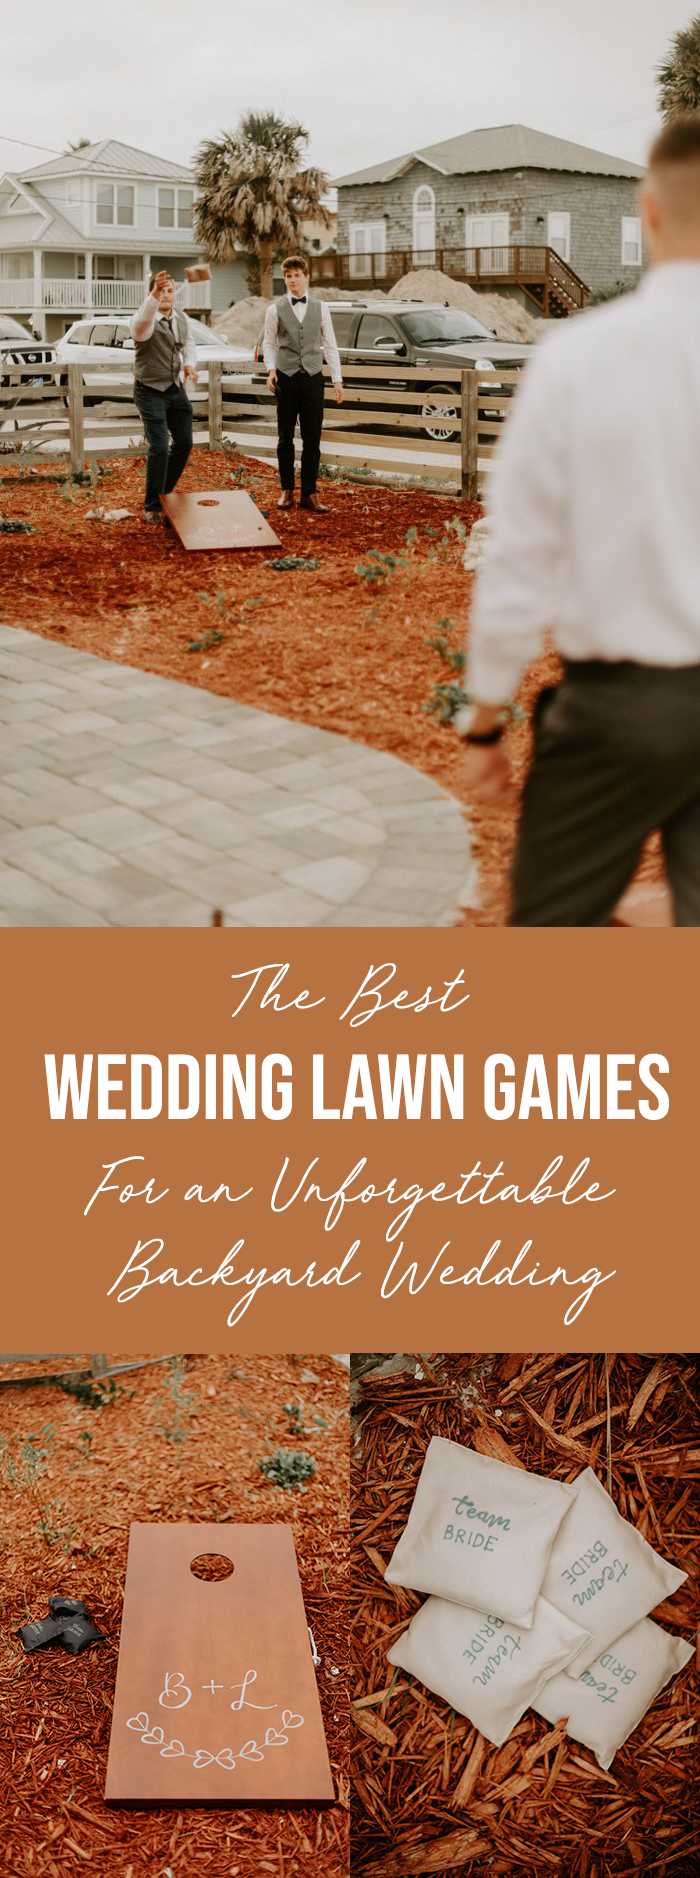 The Best Wedding Lawn Games For An Unforgettable Backyard Wedding Junebug Weddings